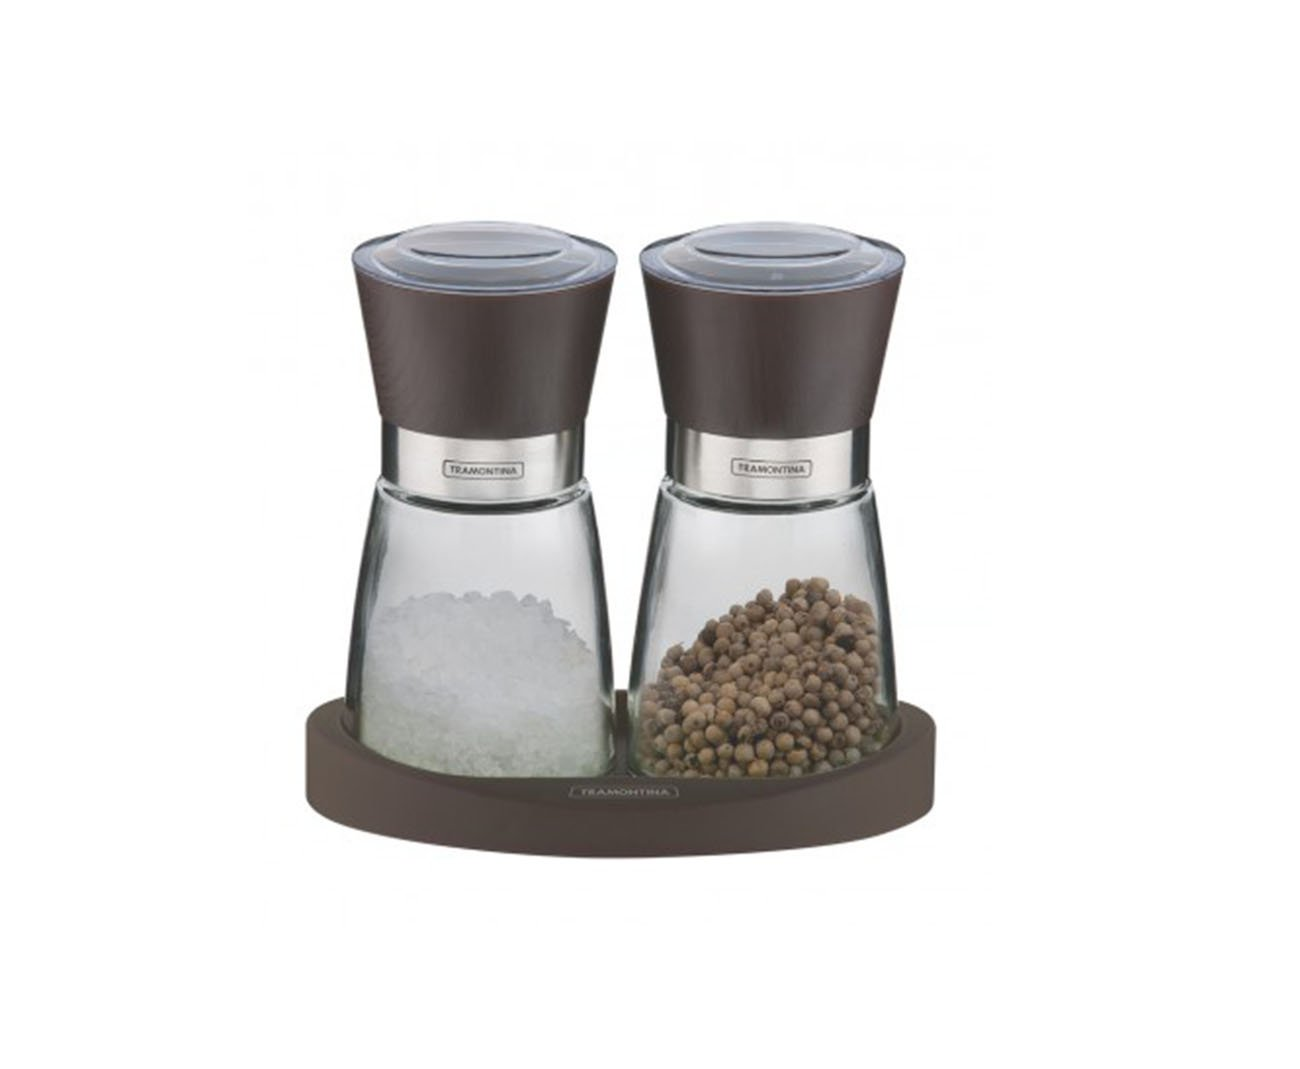 Jogo Moedor De Sal E Pimenta Recipientes De Vidros E Base De Silicone - Tramontina